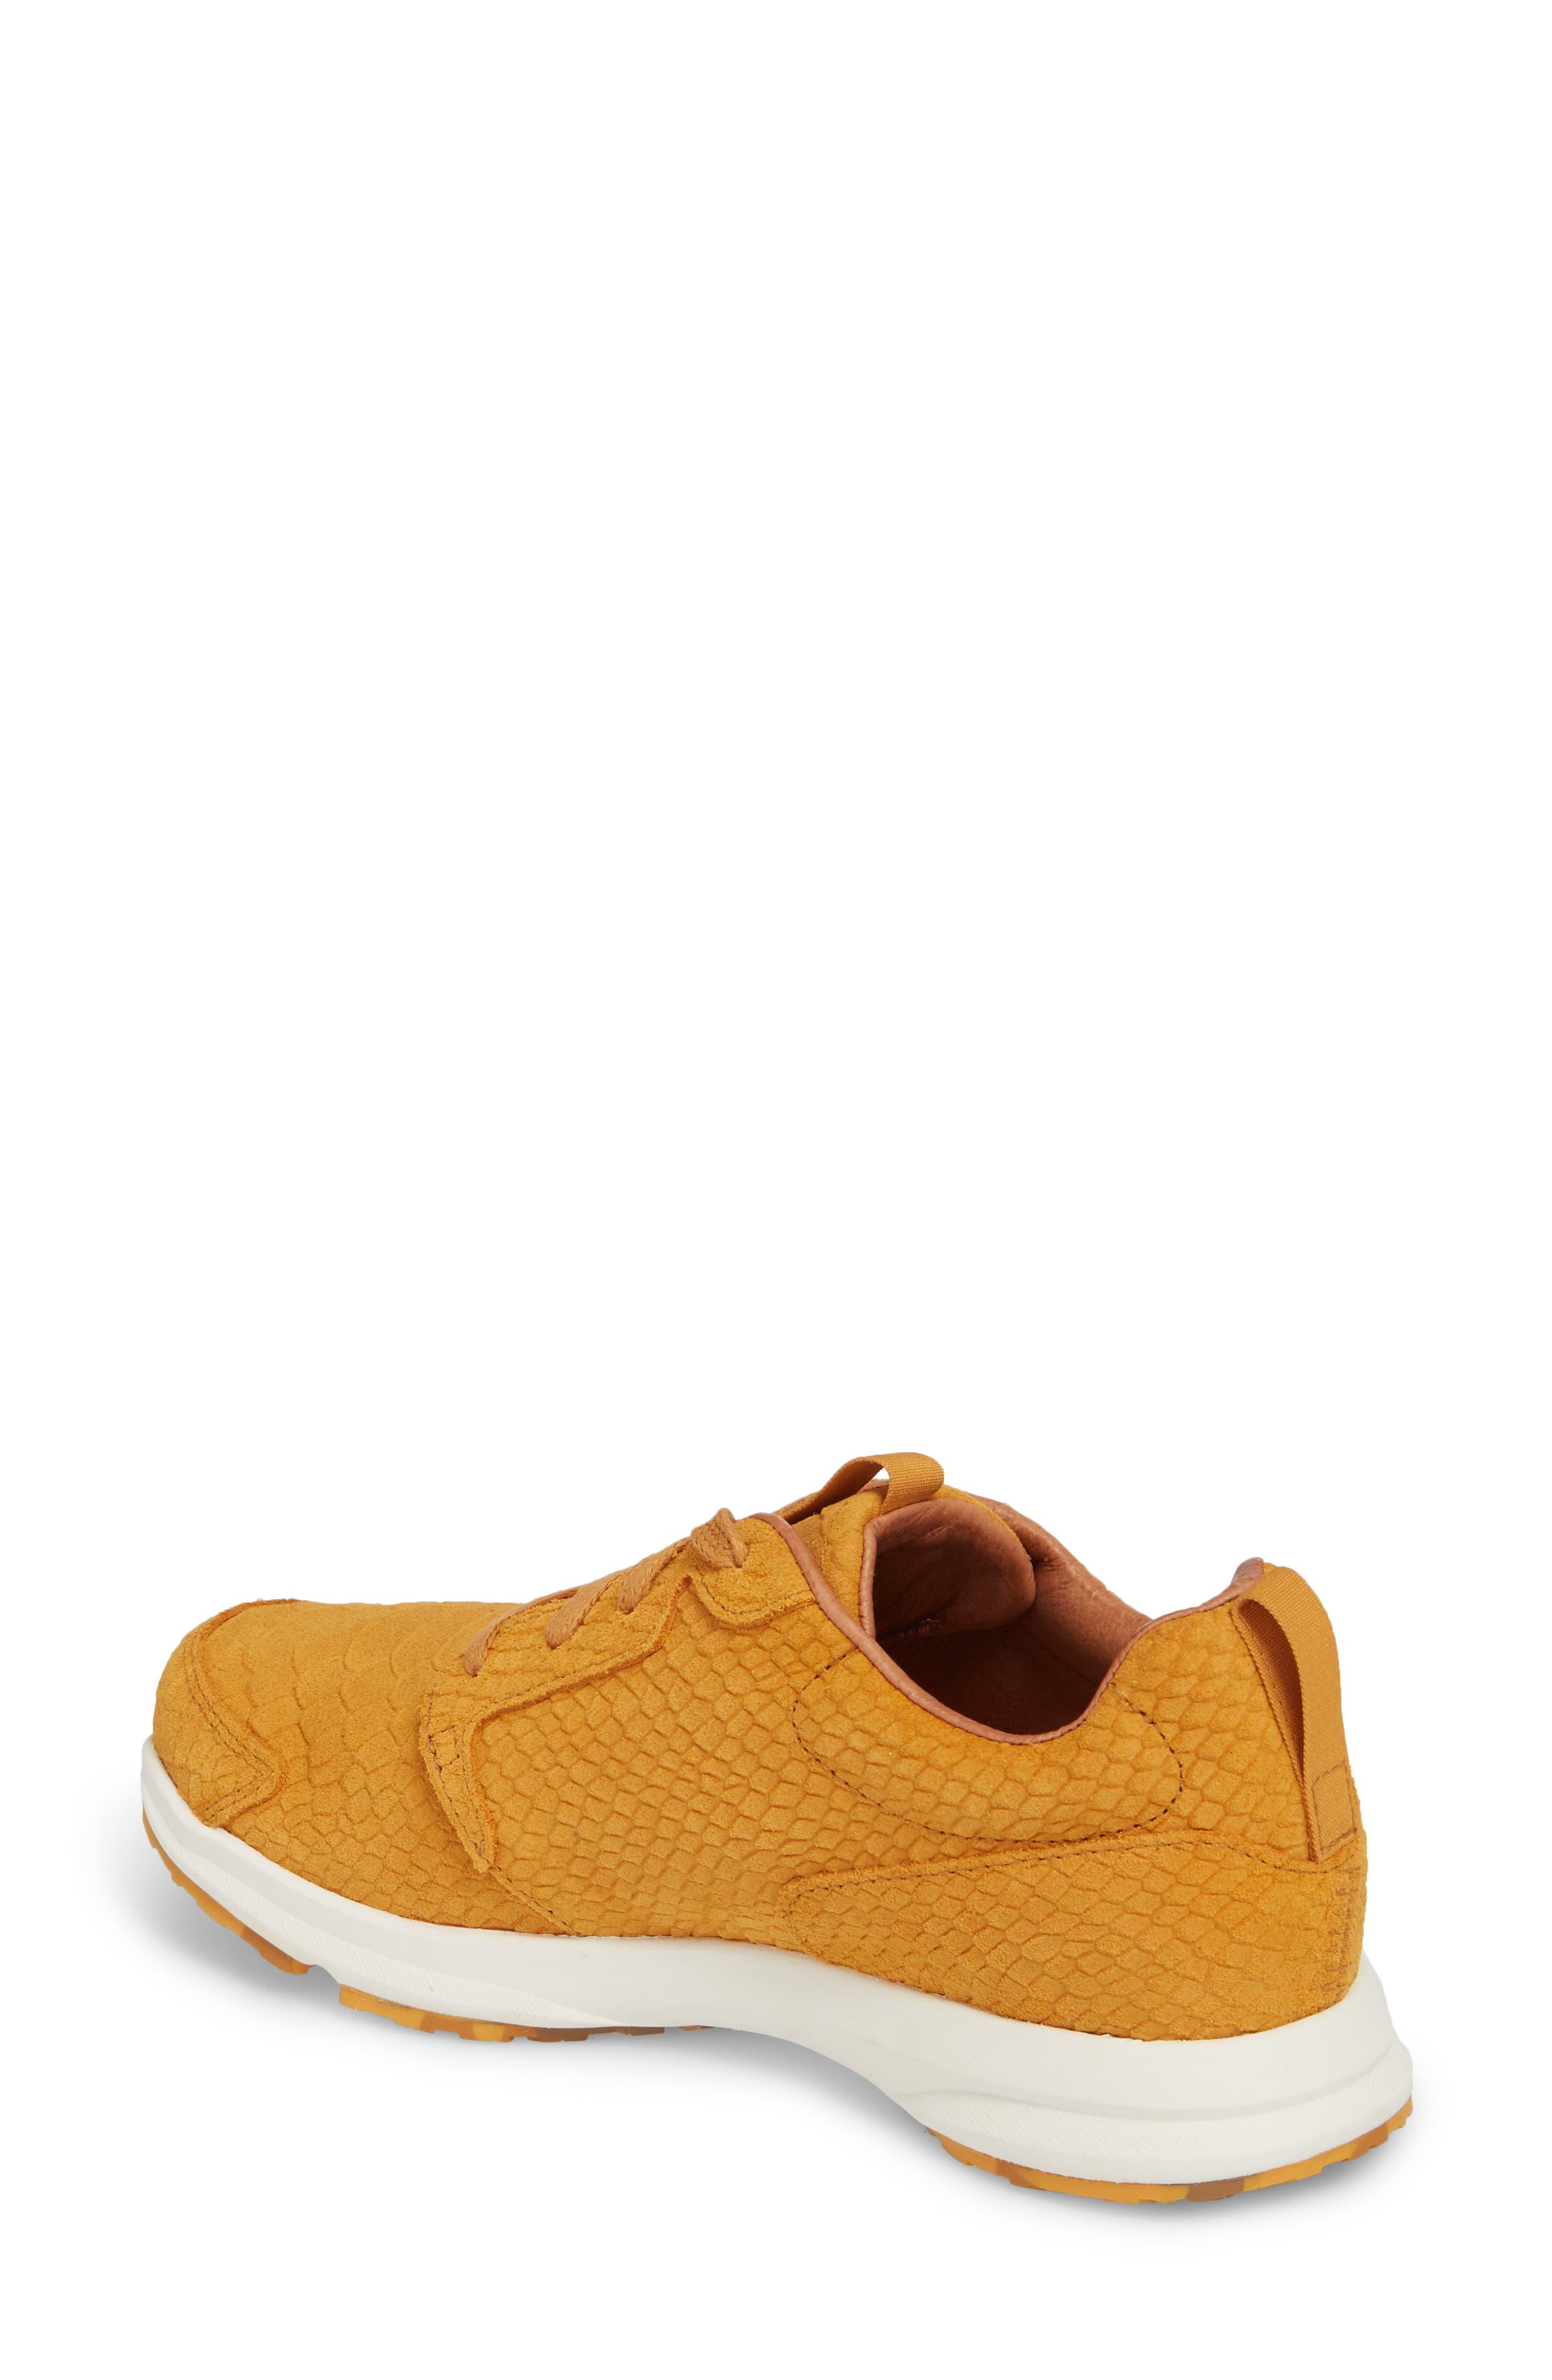 Fusion Sneaker,                             Alternate thumbnail 2, color,                             Fiery Zilla